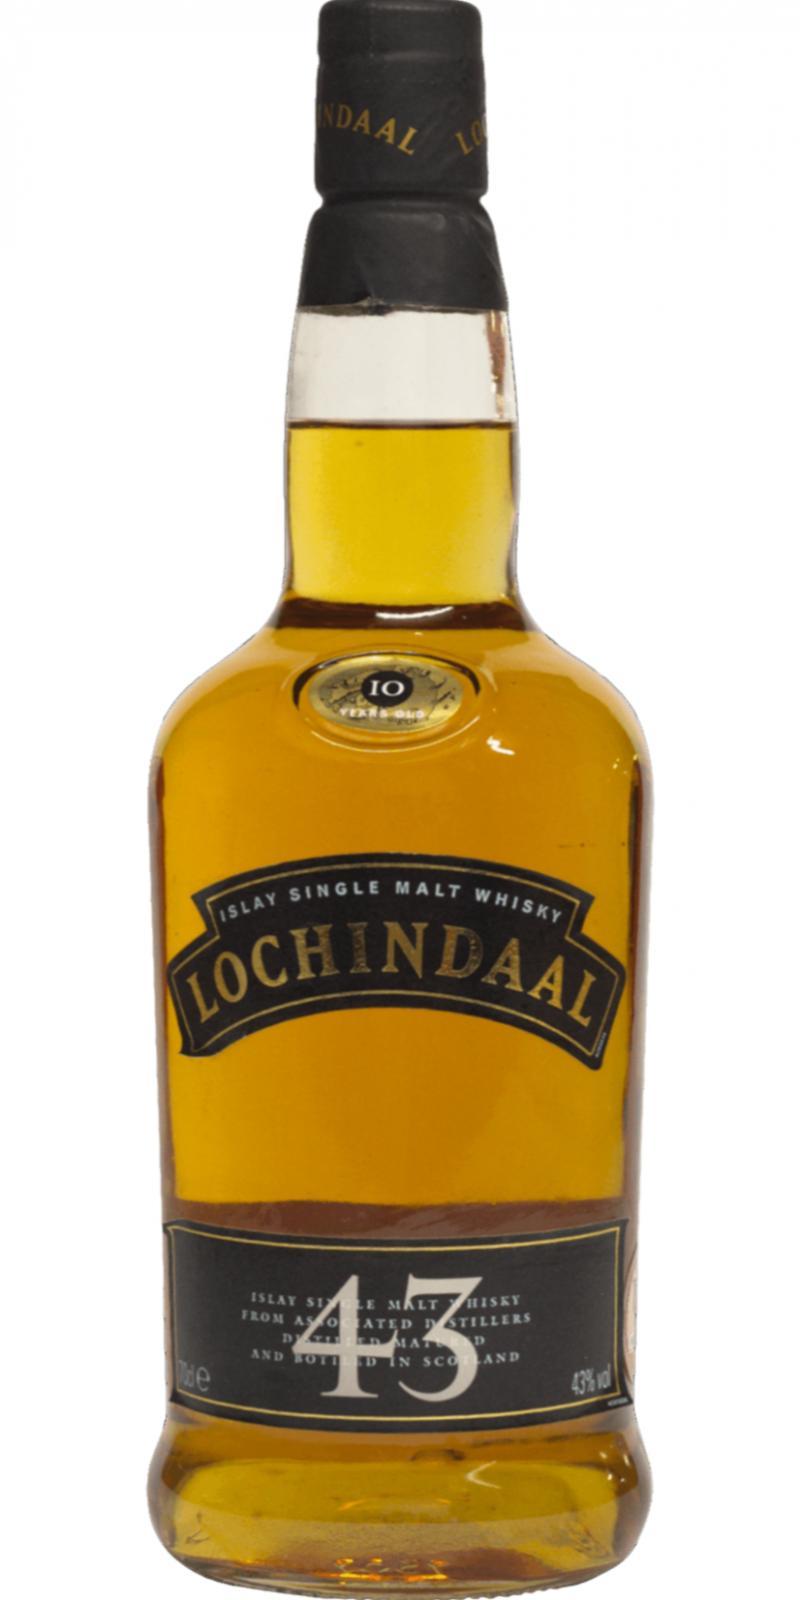 Lochindaal 10-year-old